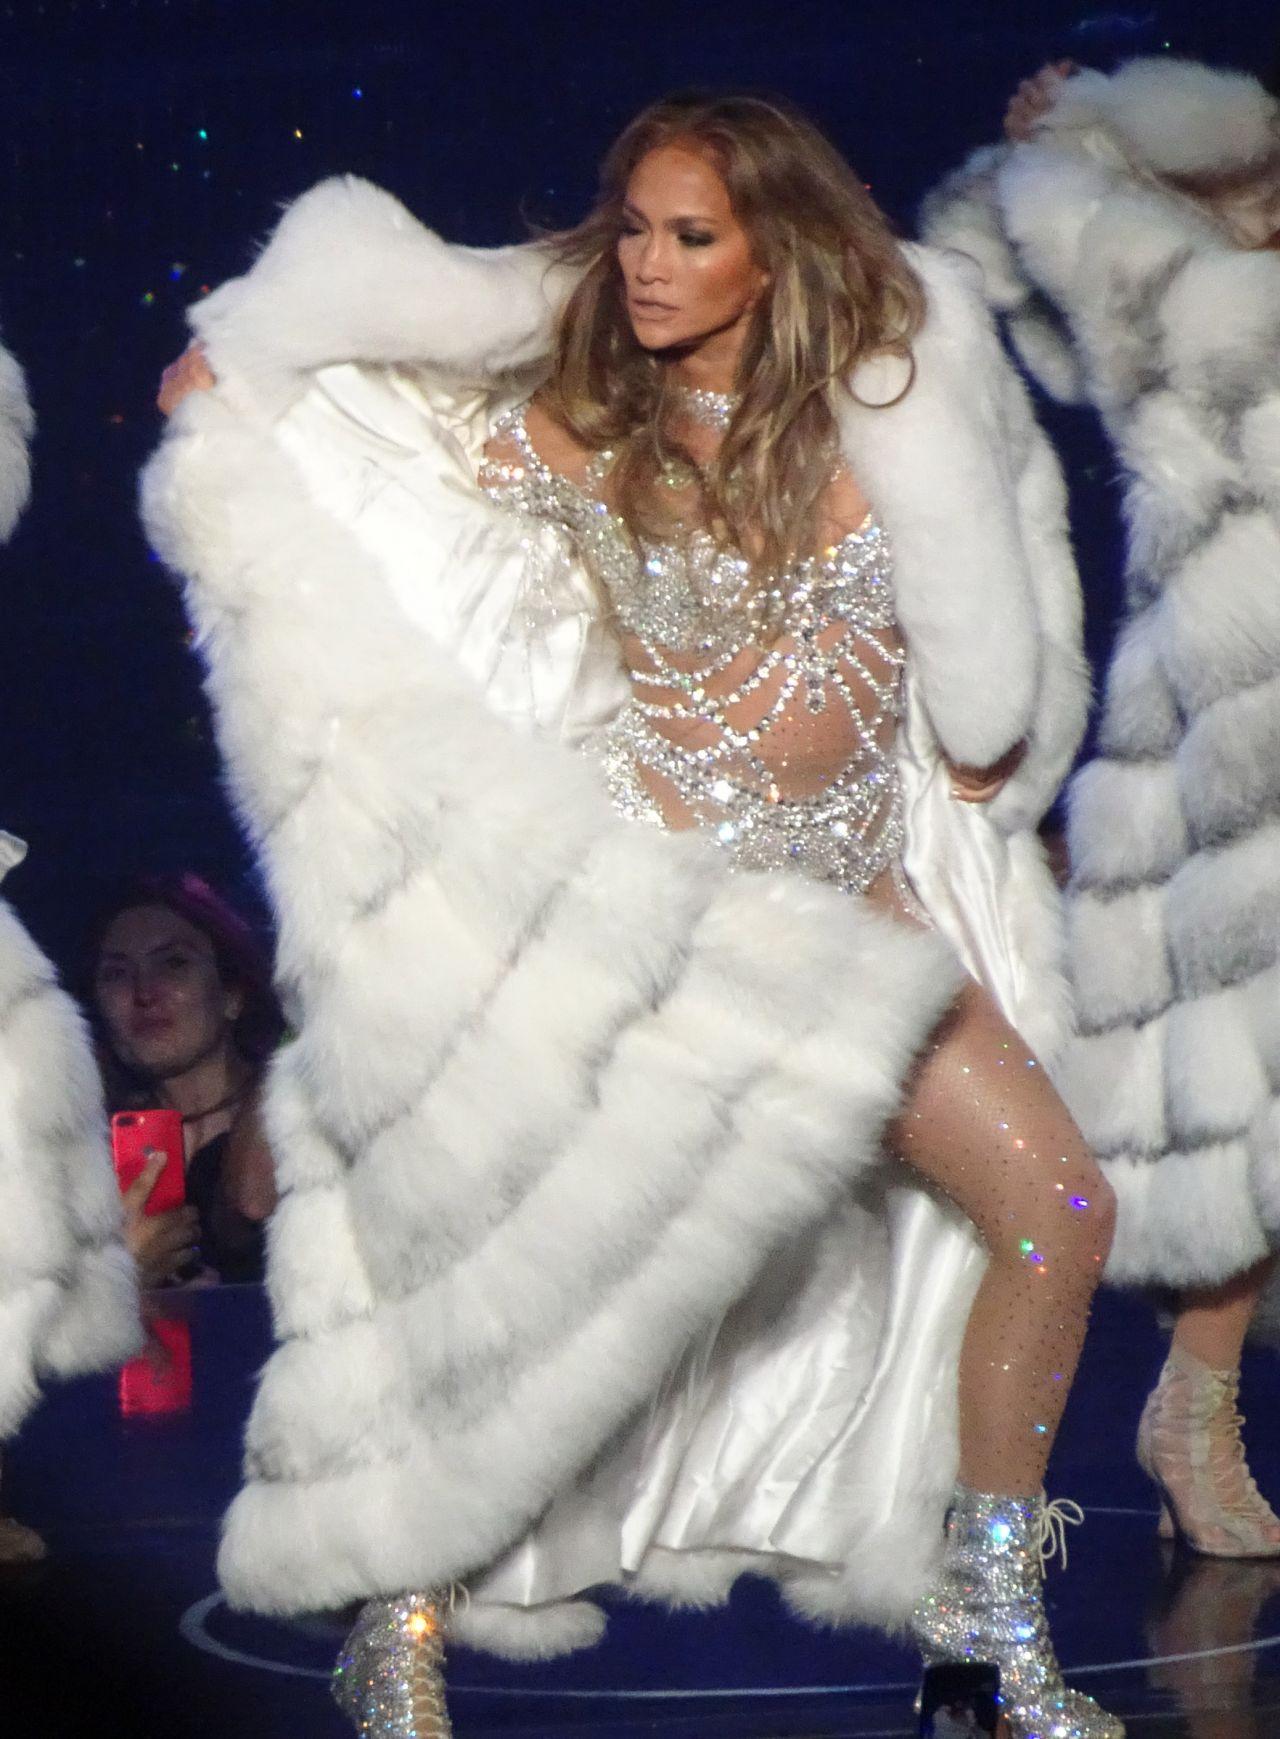 Jennifer Lopez Shows How Flexible She Is Las Vegas 09 07